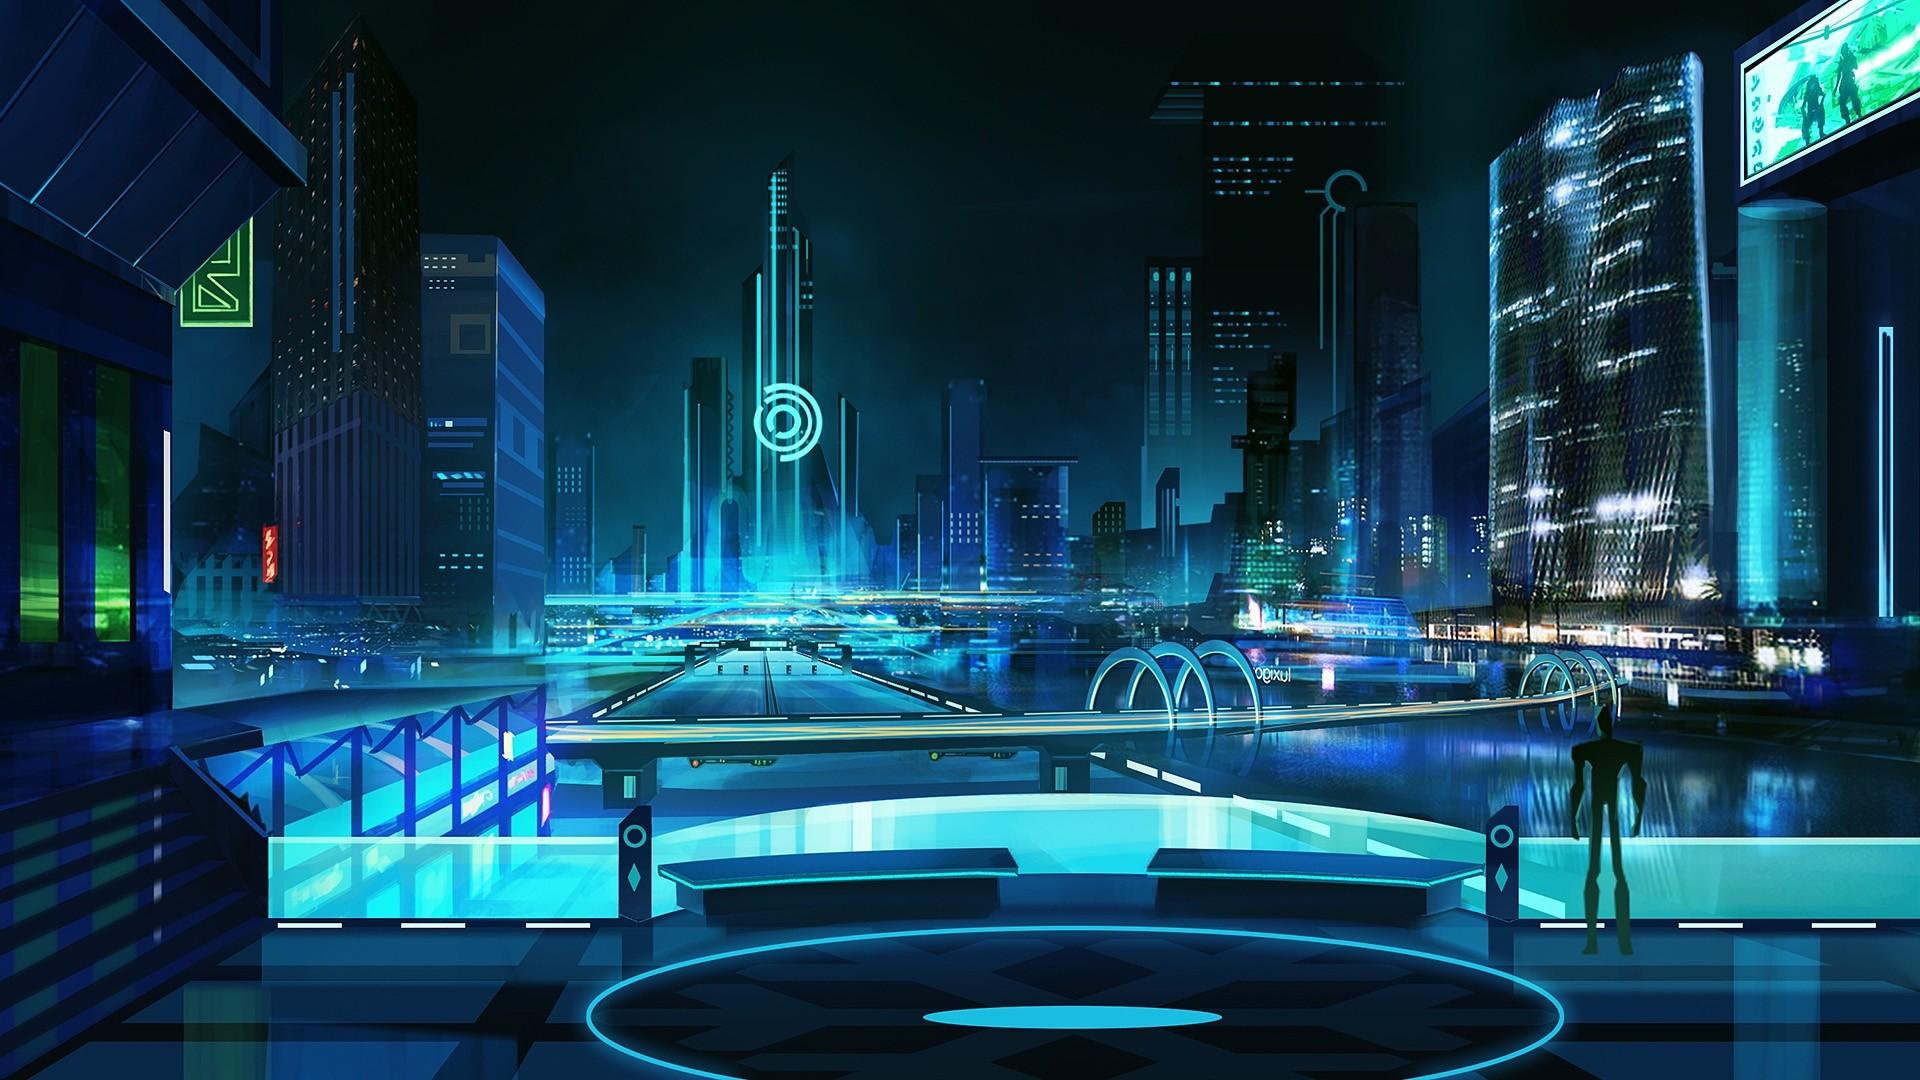 Futuristic Desktop Wallpaper